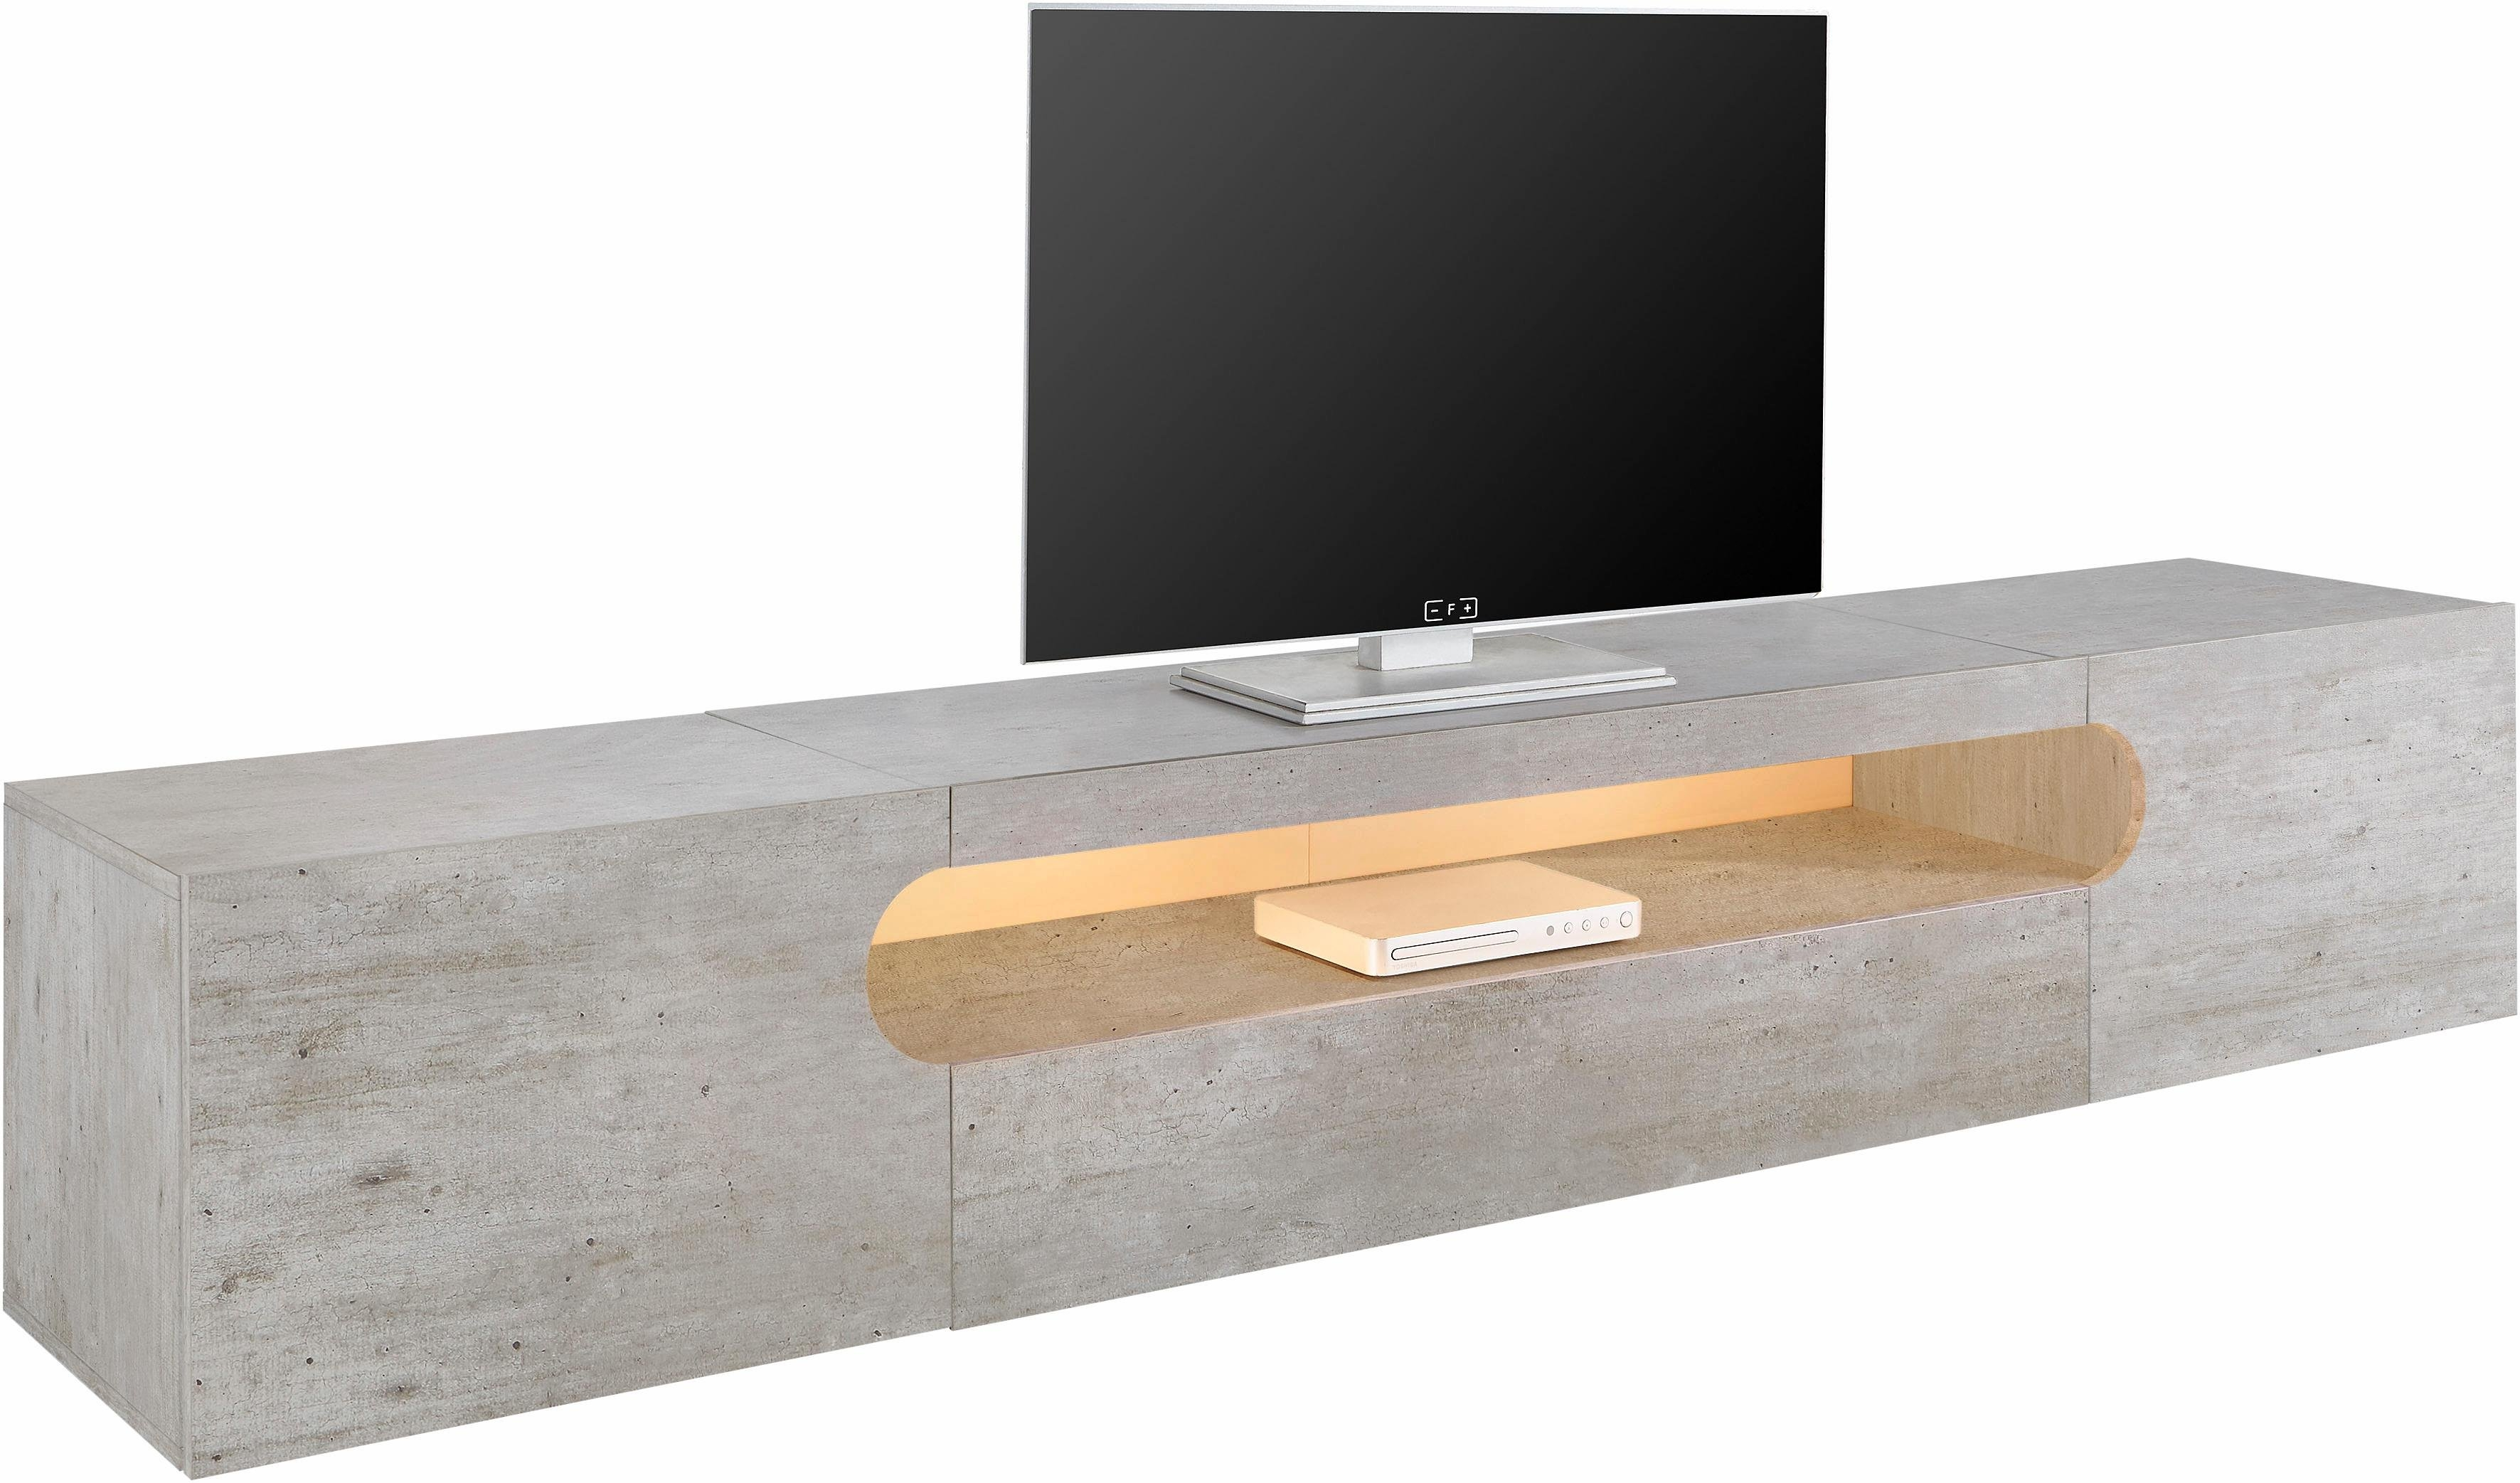 Lowboard Tv Kast.Tecnos Xxl Tv Meubel Real Breedte 240 Cm Online Bestellen Otto